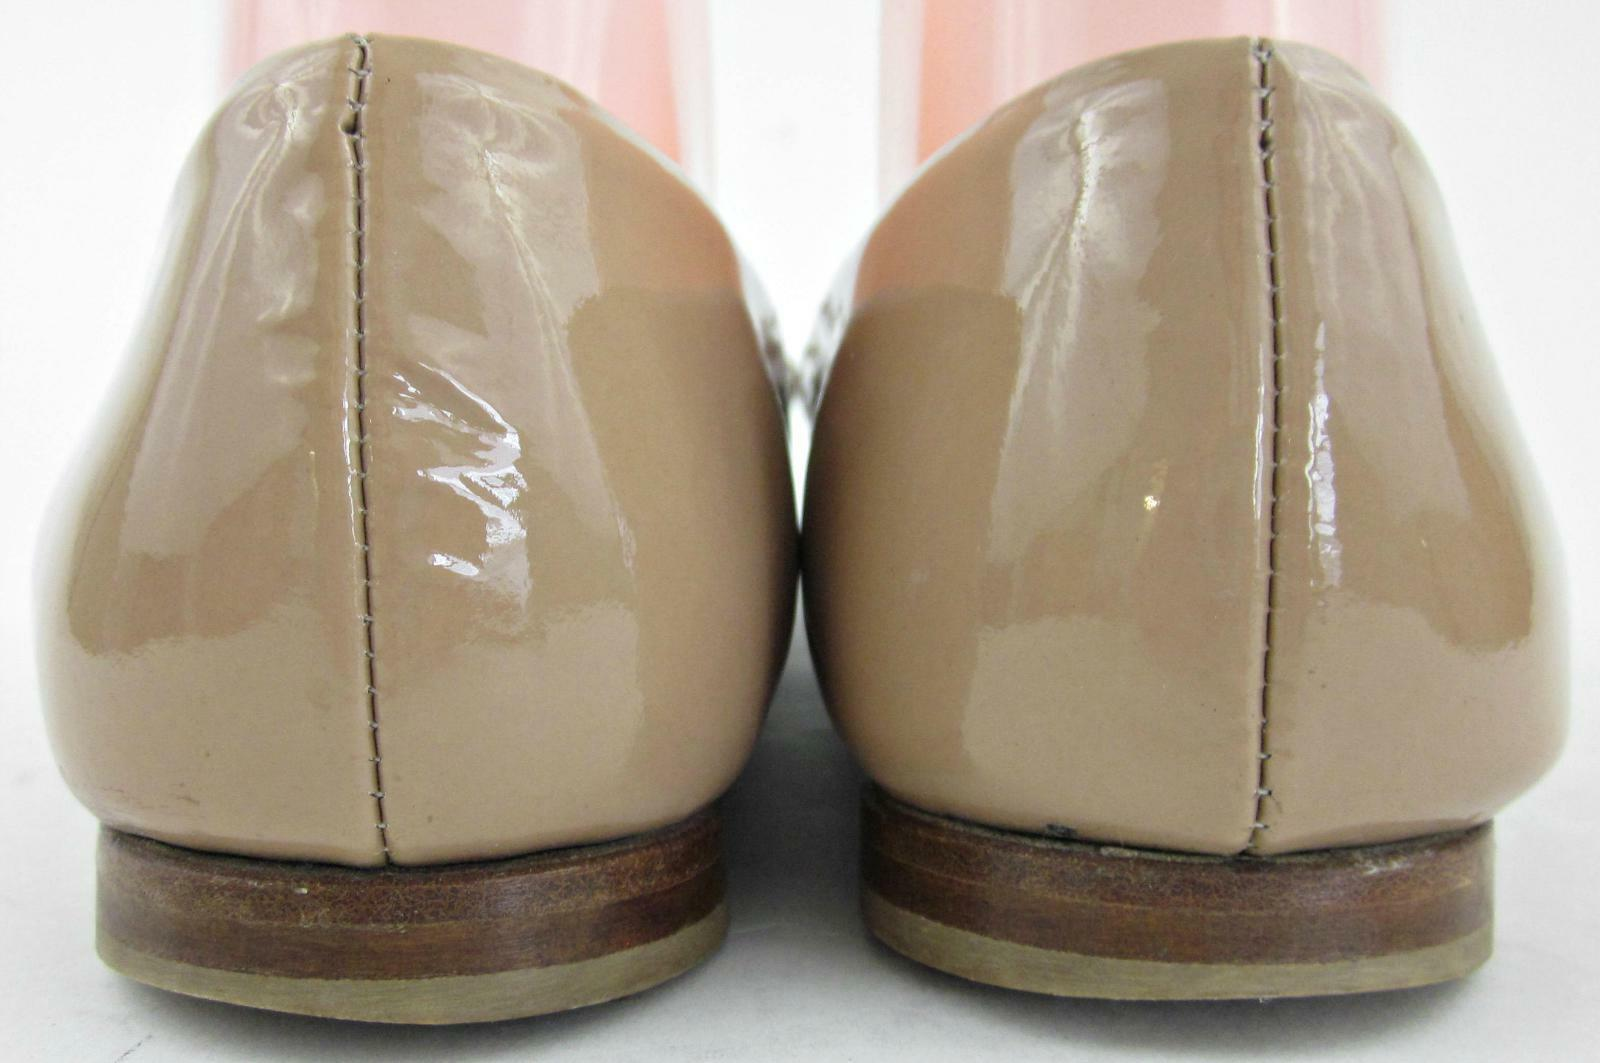 Attilio Giusti Leombruni AGL Leder Ballet Bow Flats Nude Patent Leder AGL EU 37.5 US 7.5 11995a